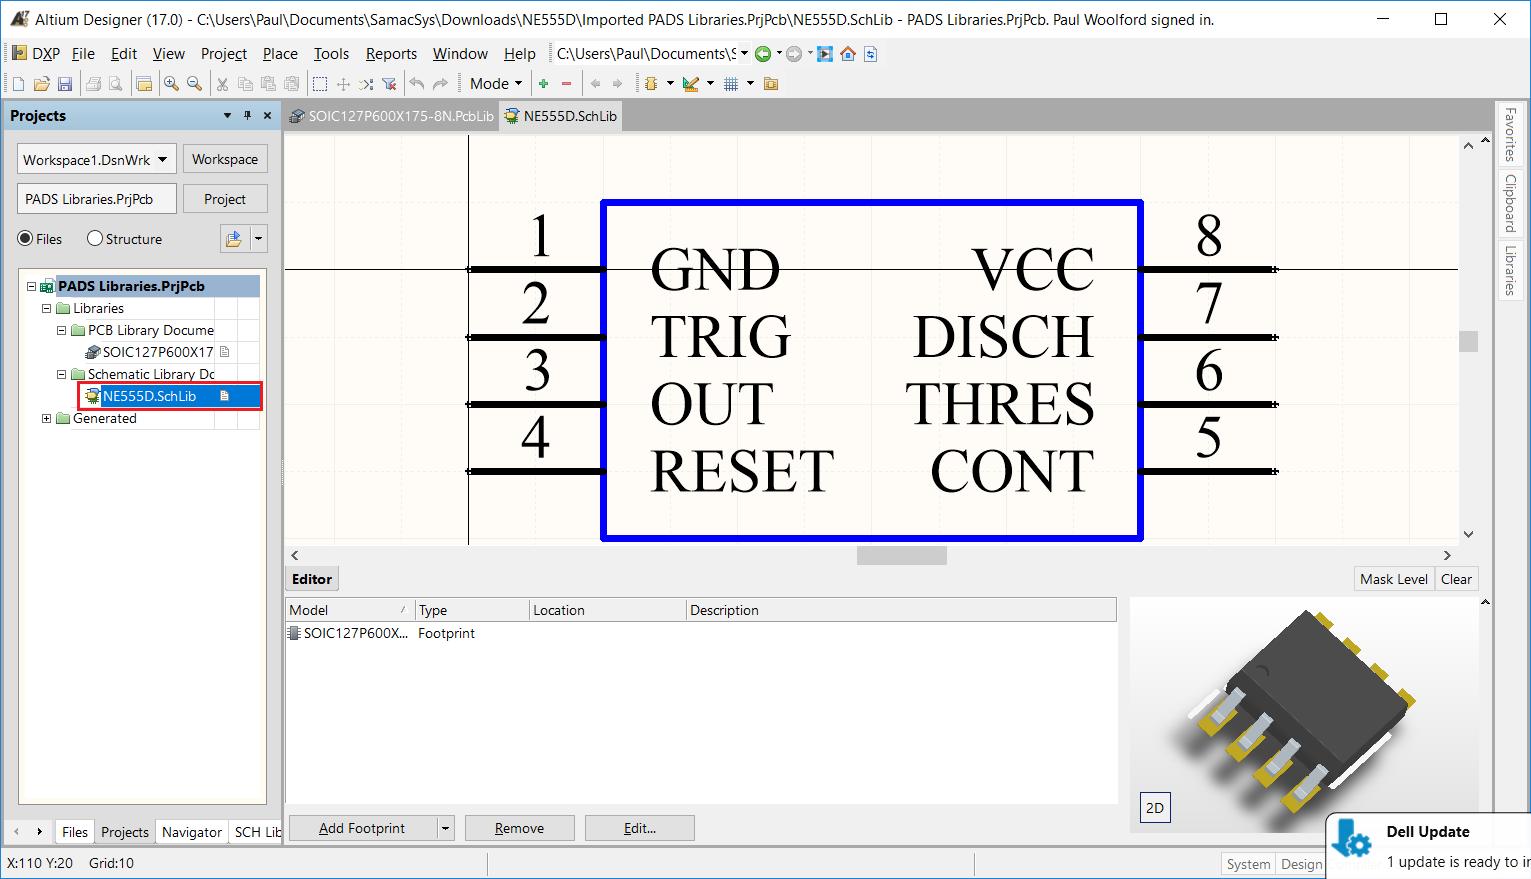 Altium Designer Pcb Library Free Footprints Symbols 3d Models Circuit Maker 2000 Software Download 8 Reopen The Schematic Document